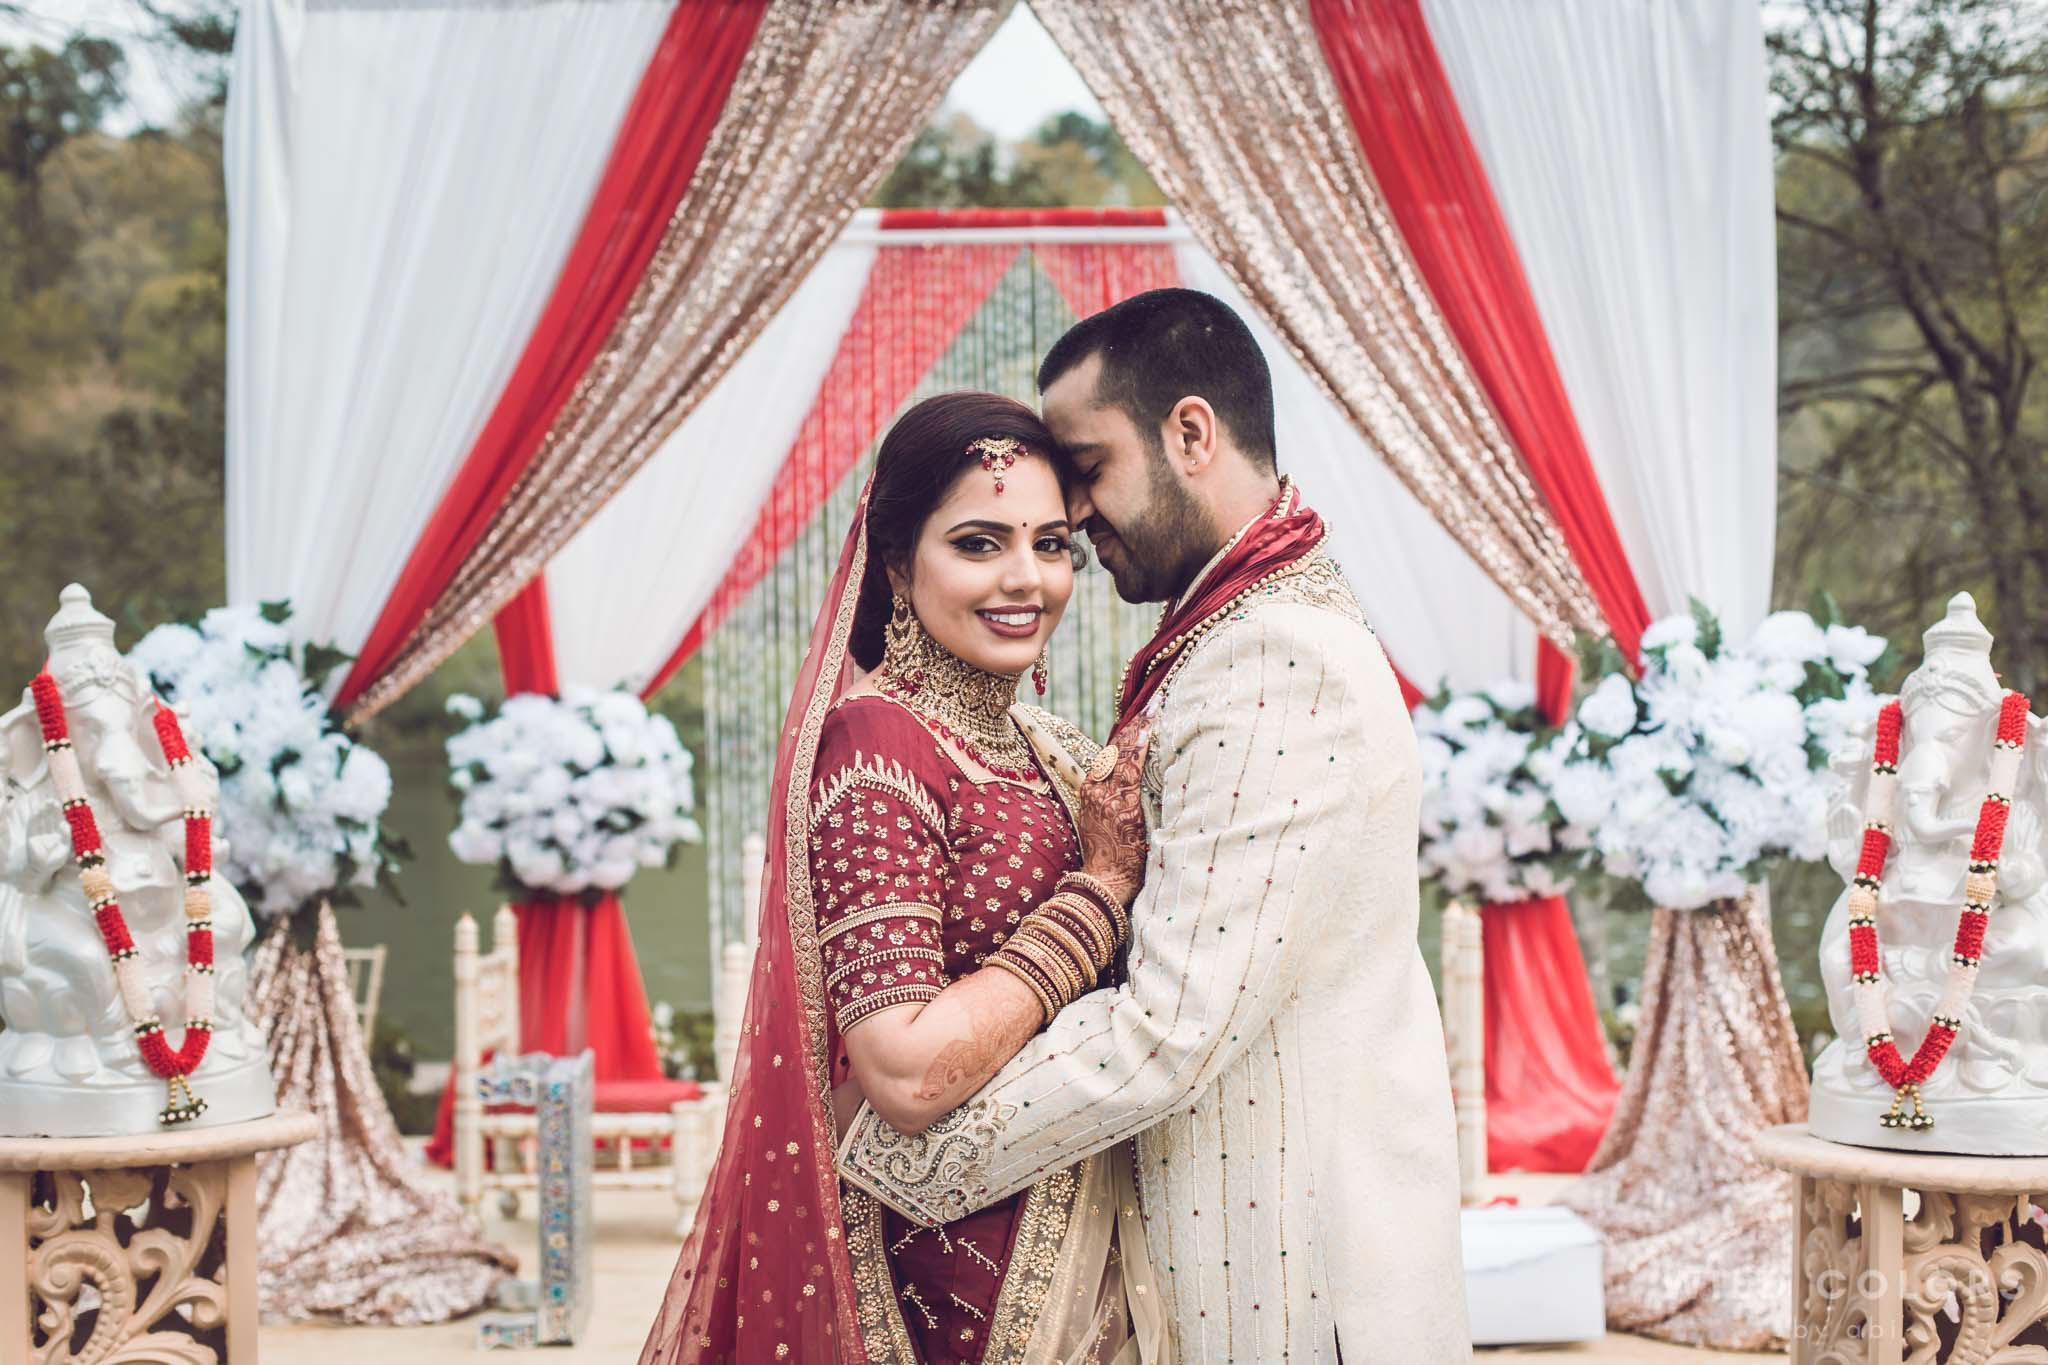 CANDID_INDIAN_WEDDING_ATLANTA_PHOTOGRAPHER-25.JPG